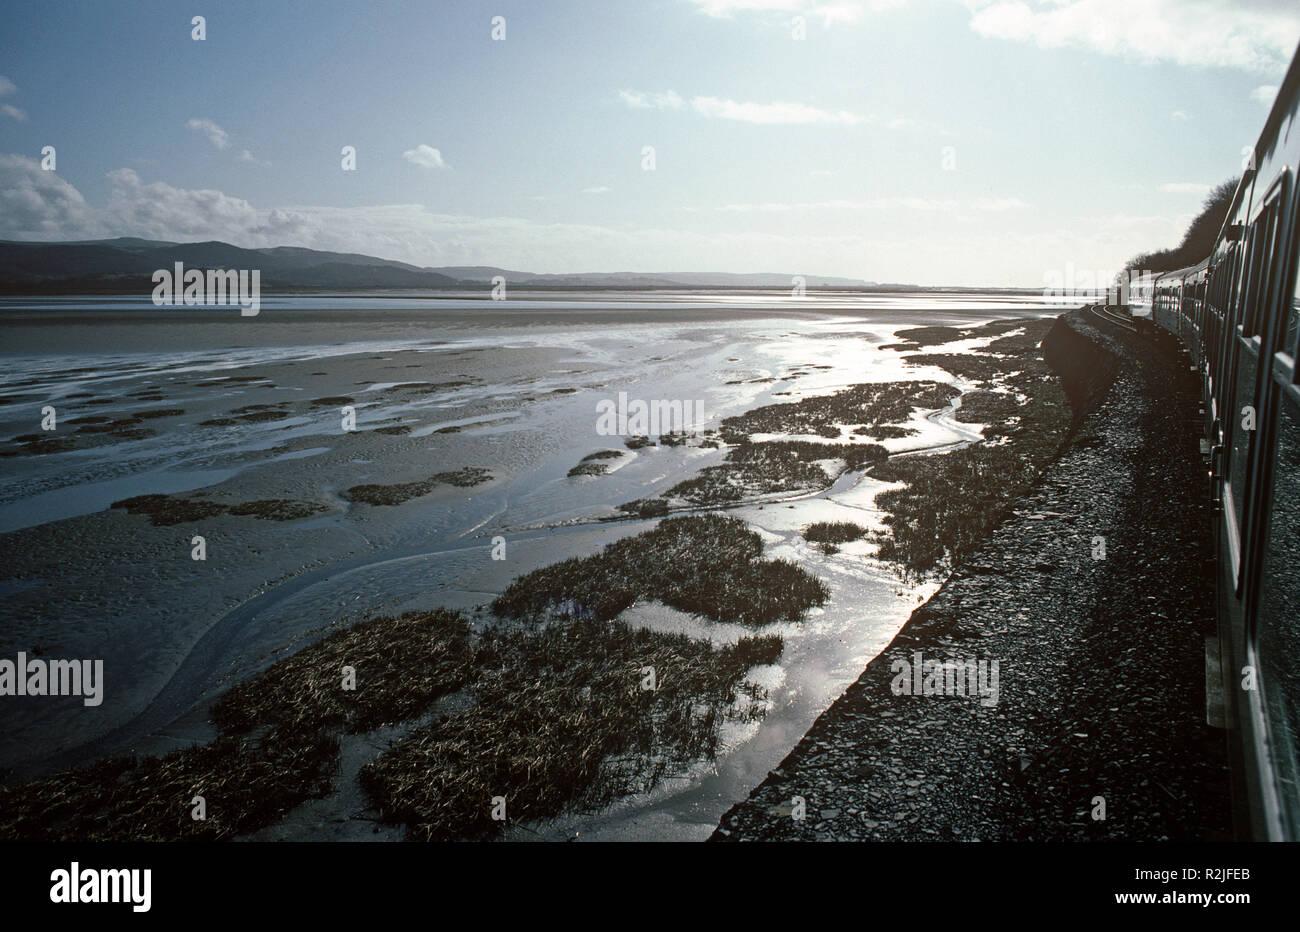 Dyfi Estuary, Cambrian Coast railway line from Dovey Junction to Pwllheli railway line - Stock Image